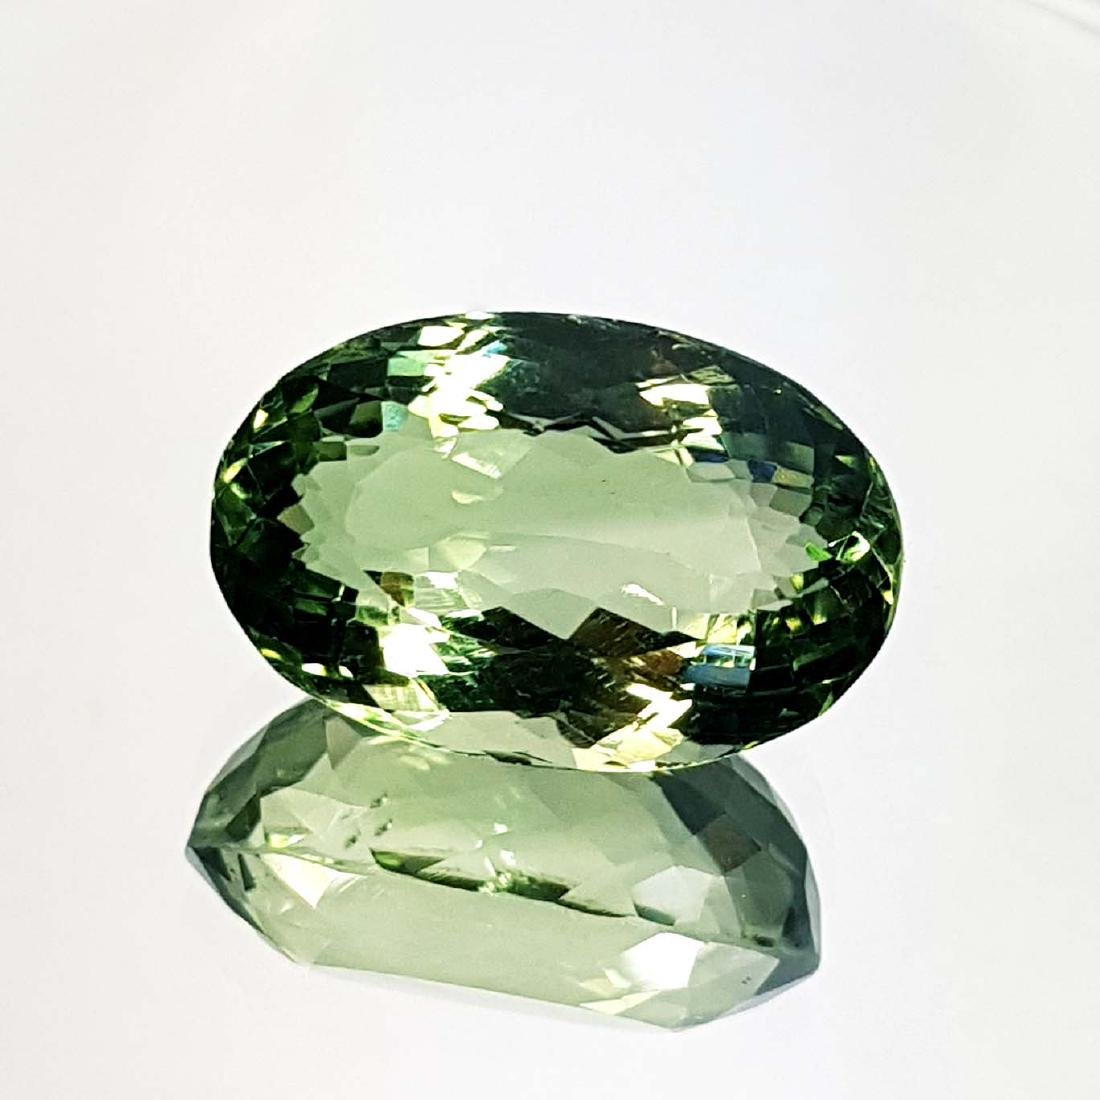 Green Amethyst - 19.74 ct